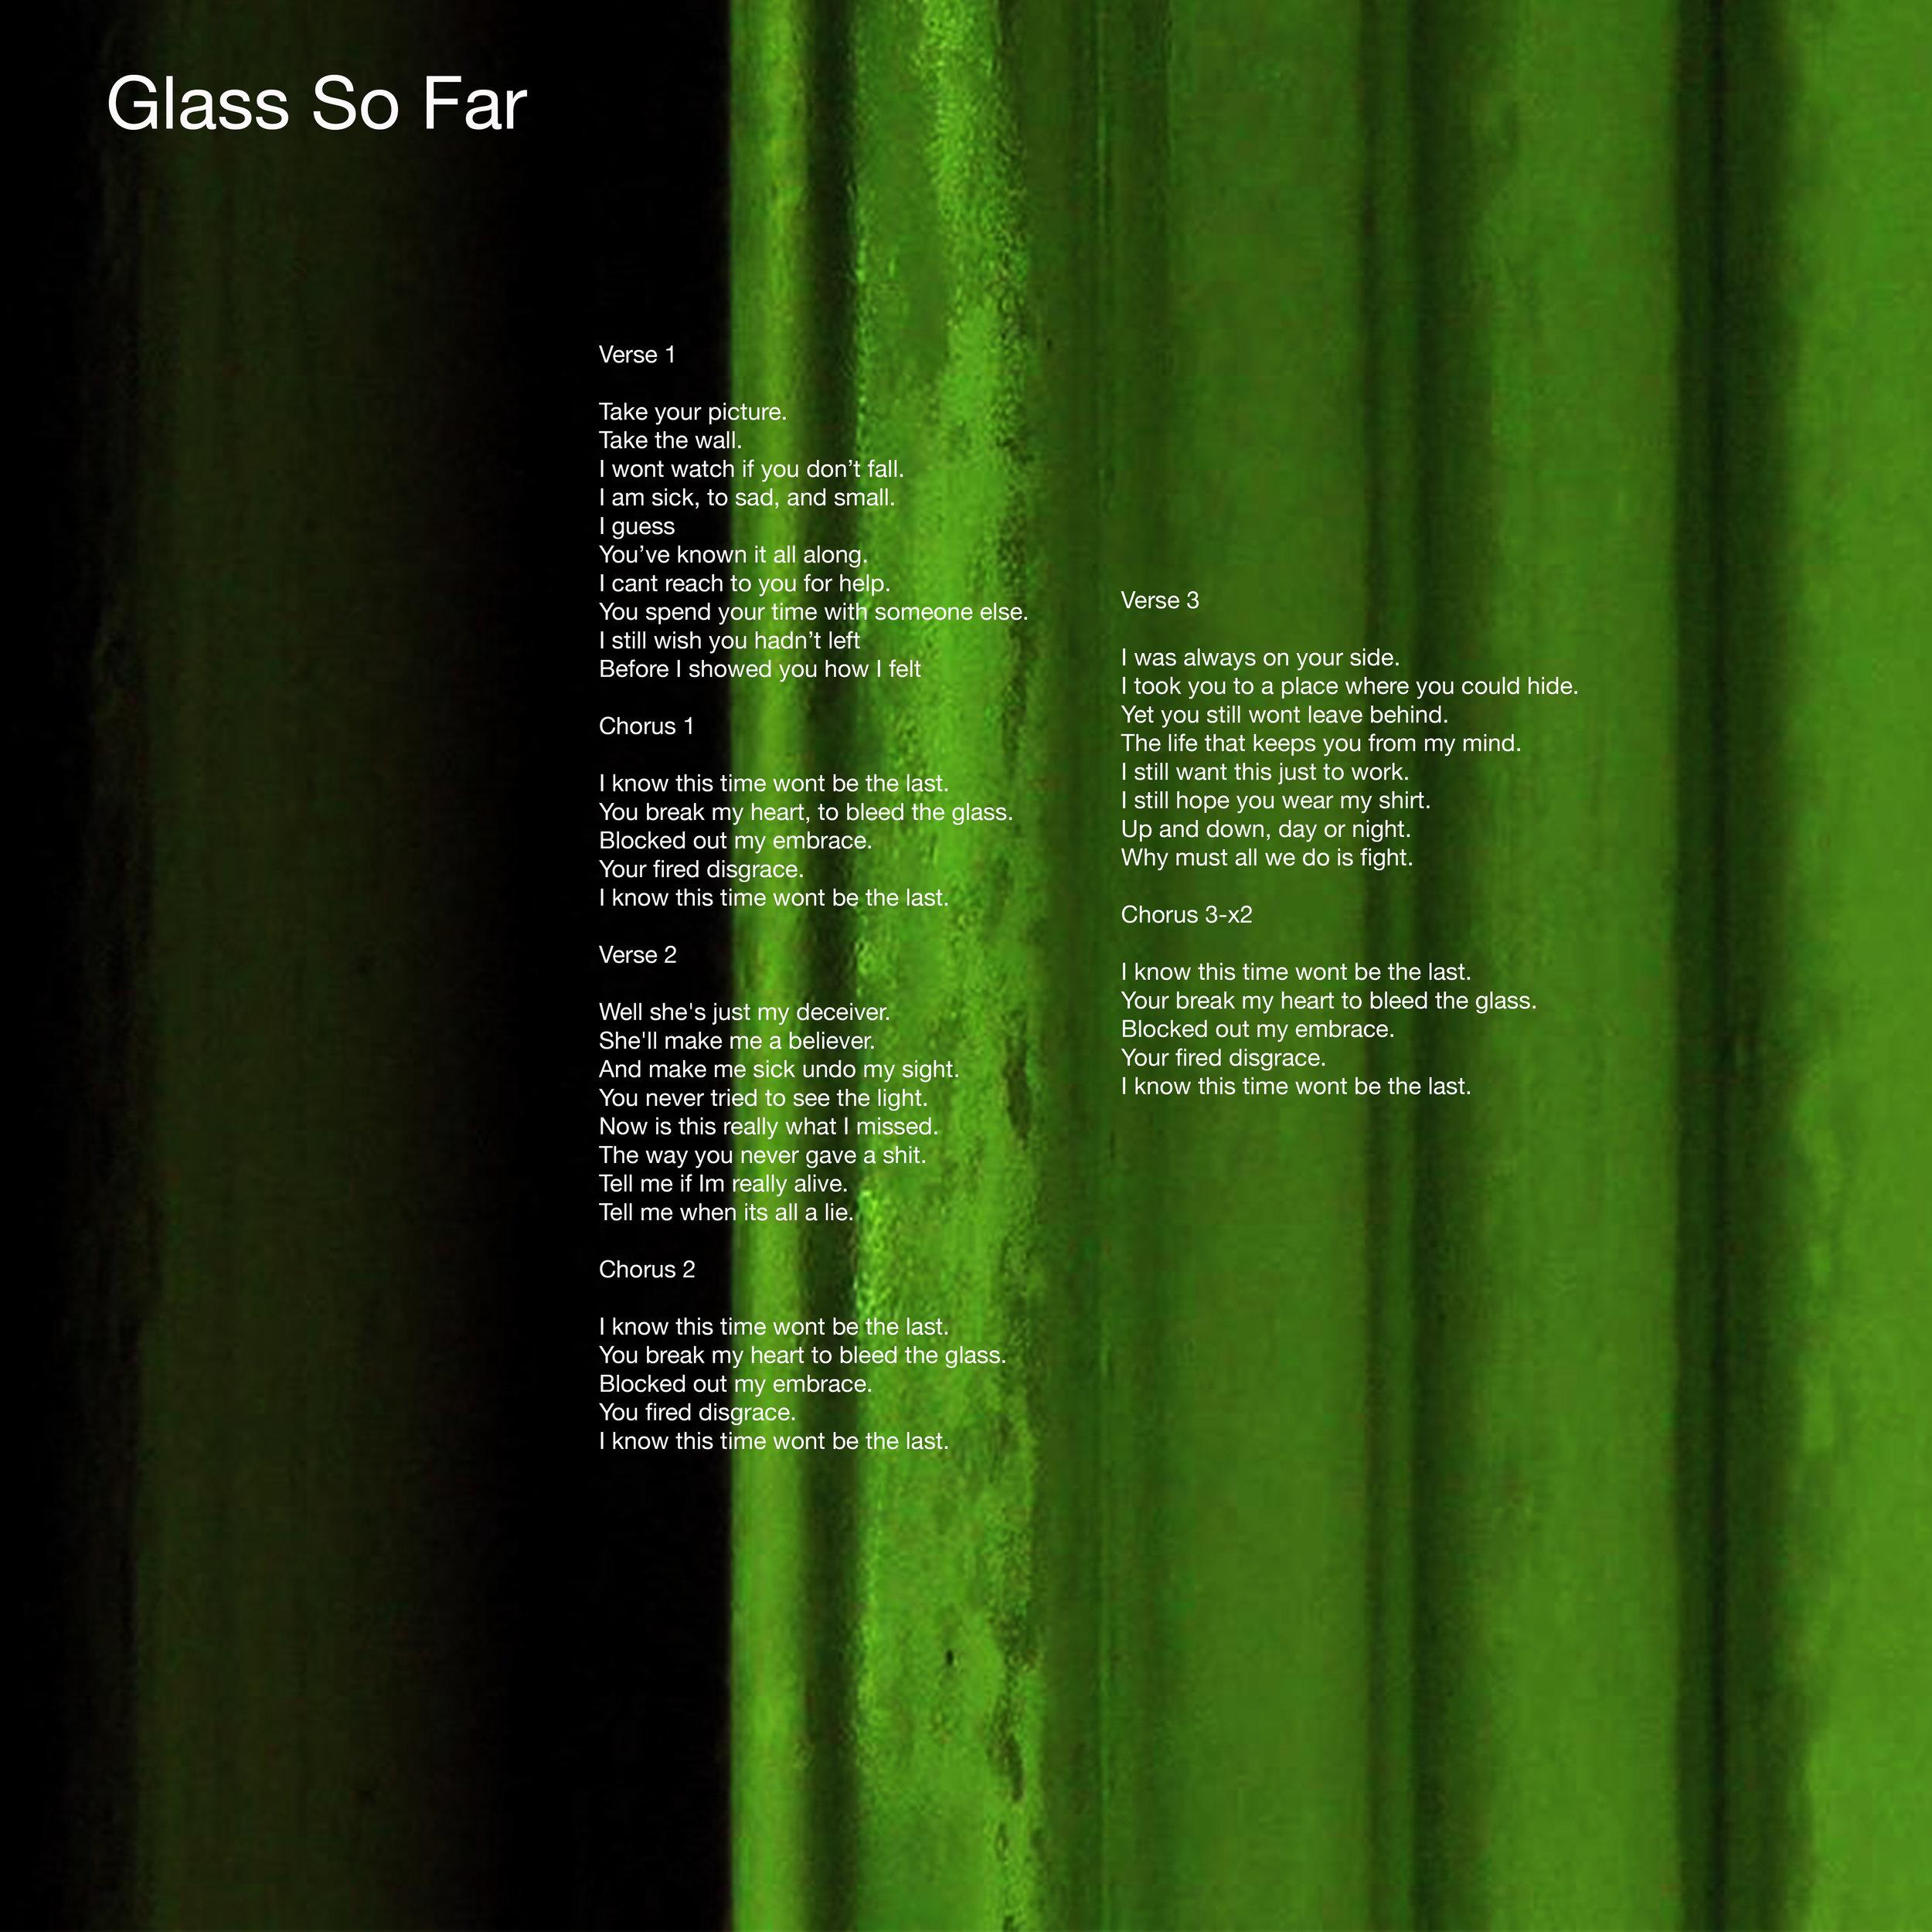 GlasssofarMTheoryLyricArtDLX.jpg